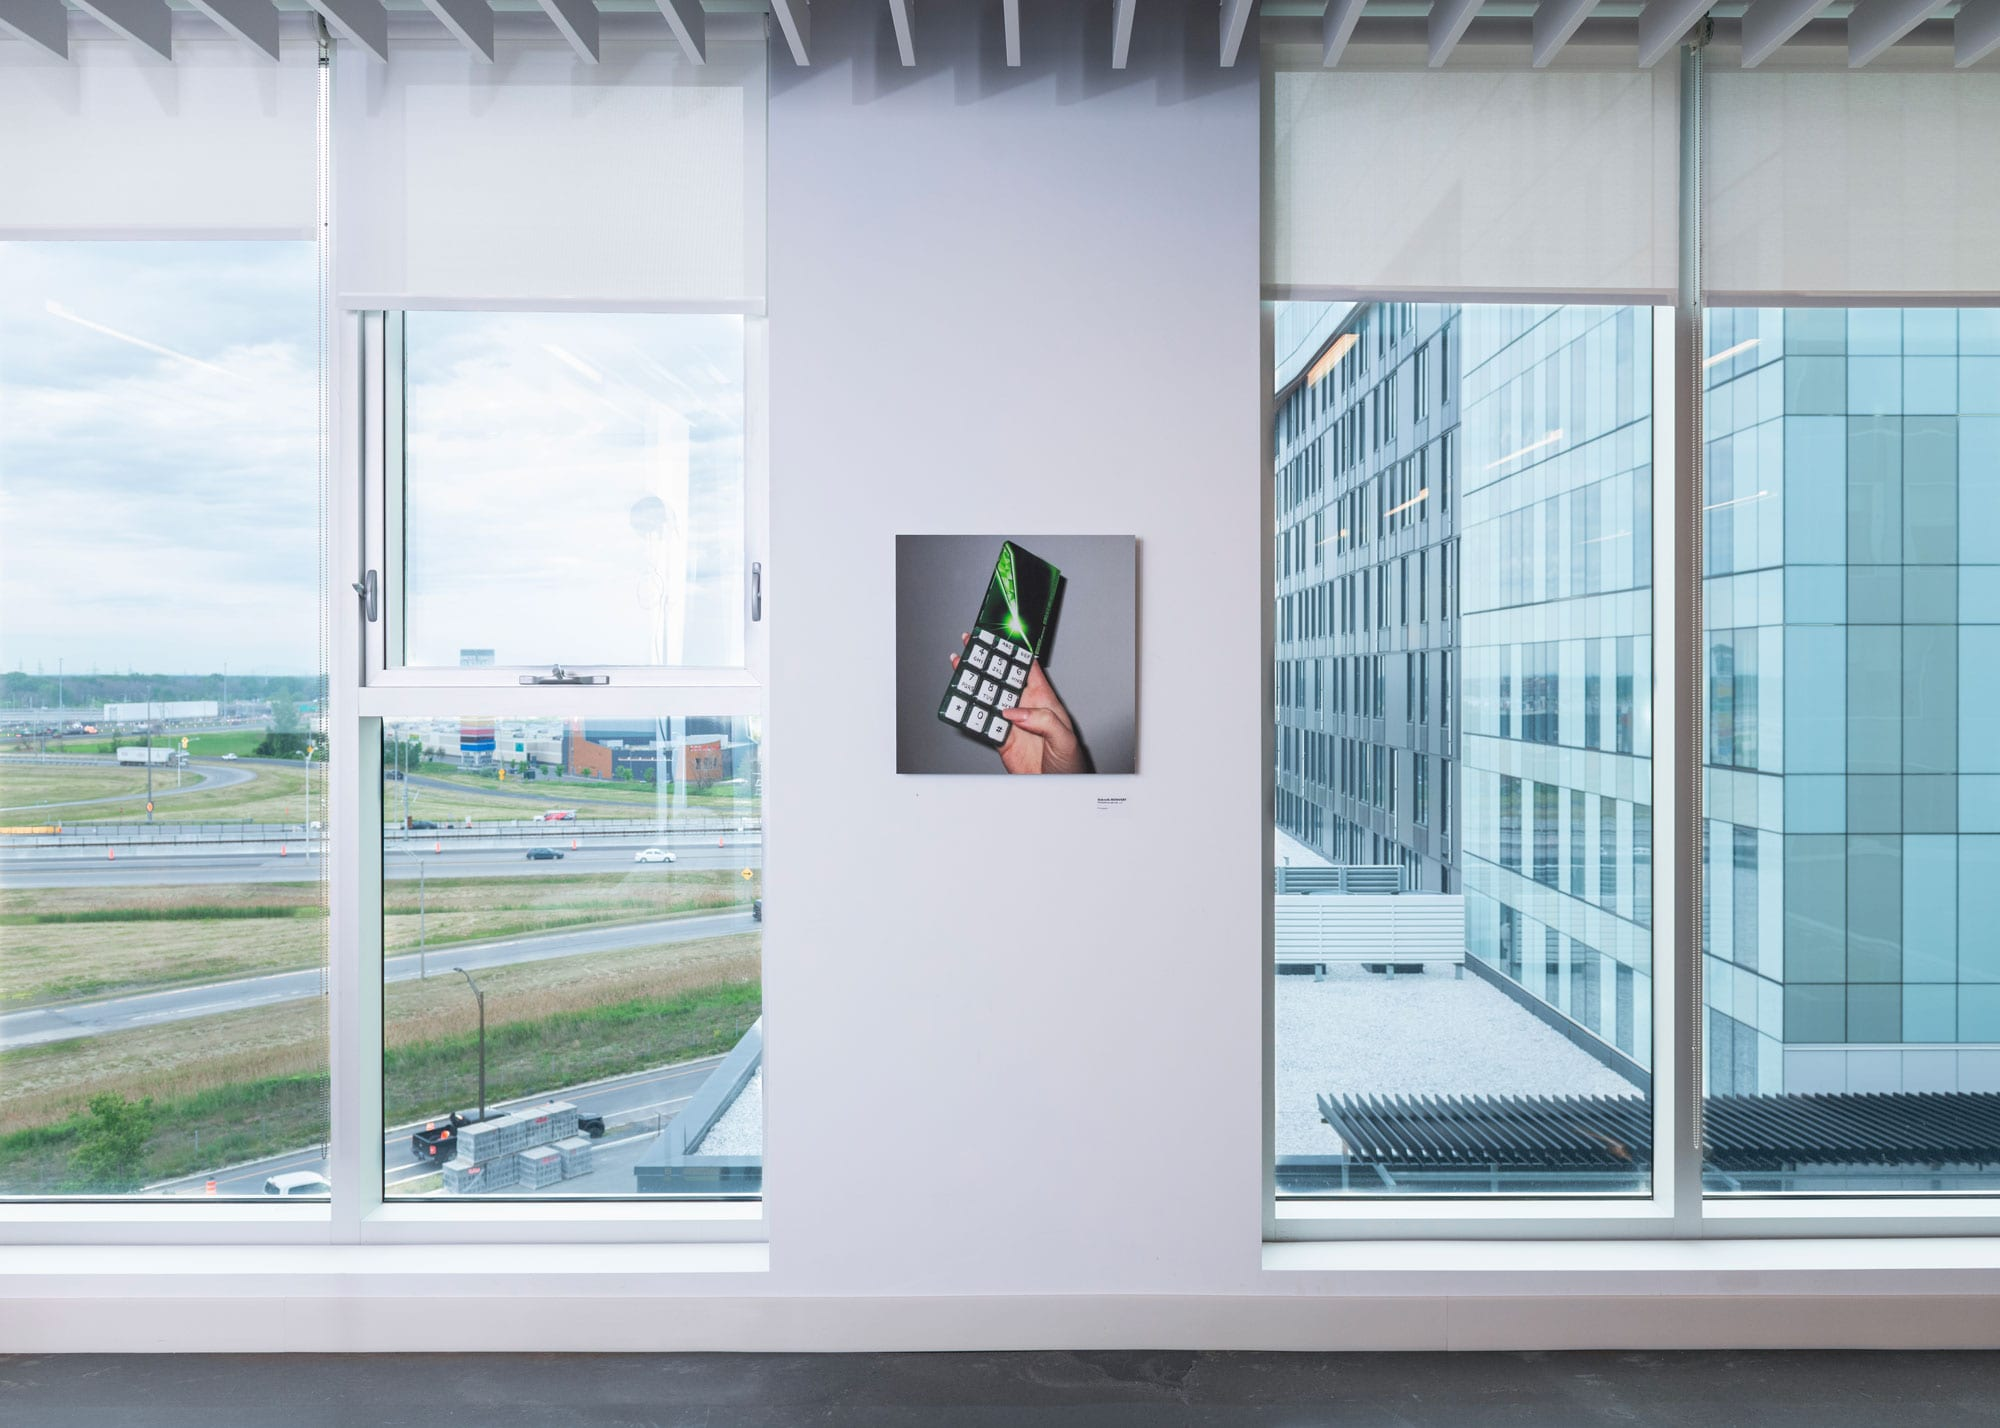 KPMG Montreal Rive Sud - Office Design / Art Collection by MASSIVart - Gab Bois